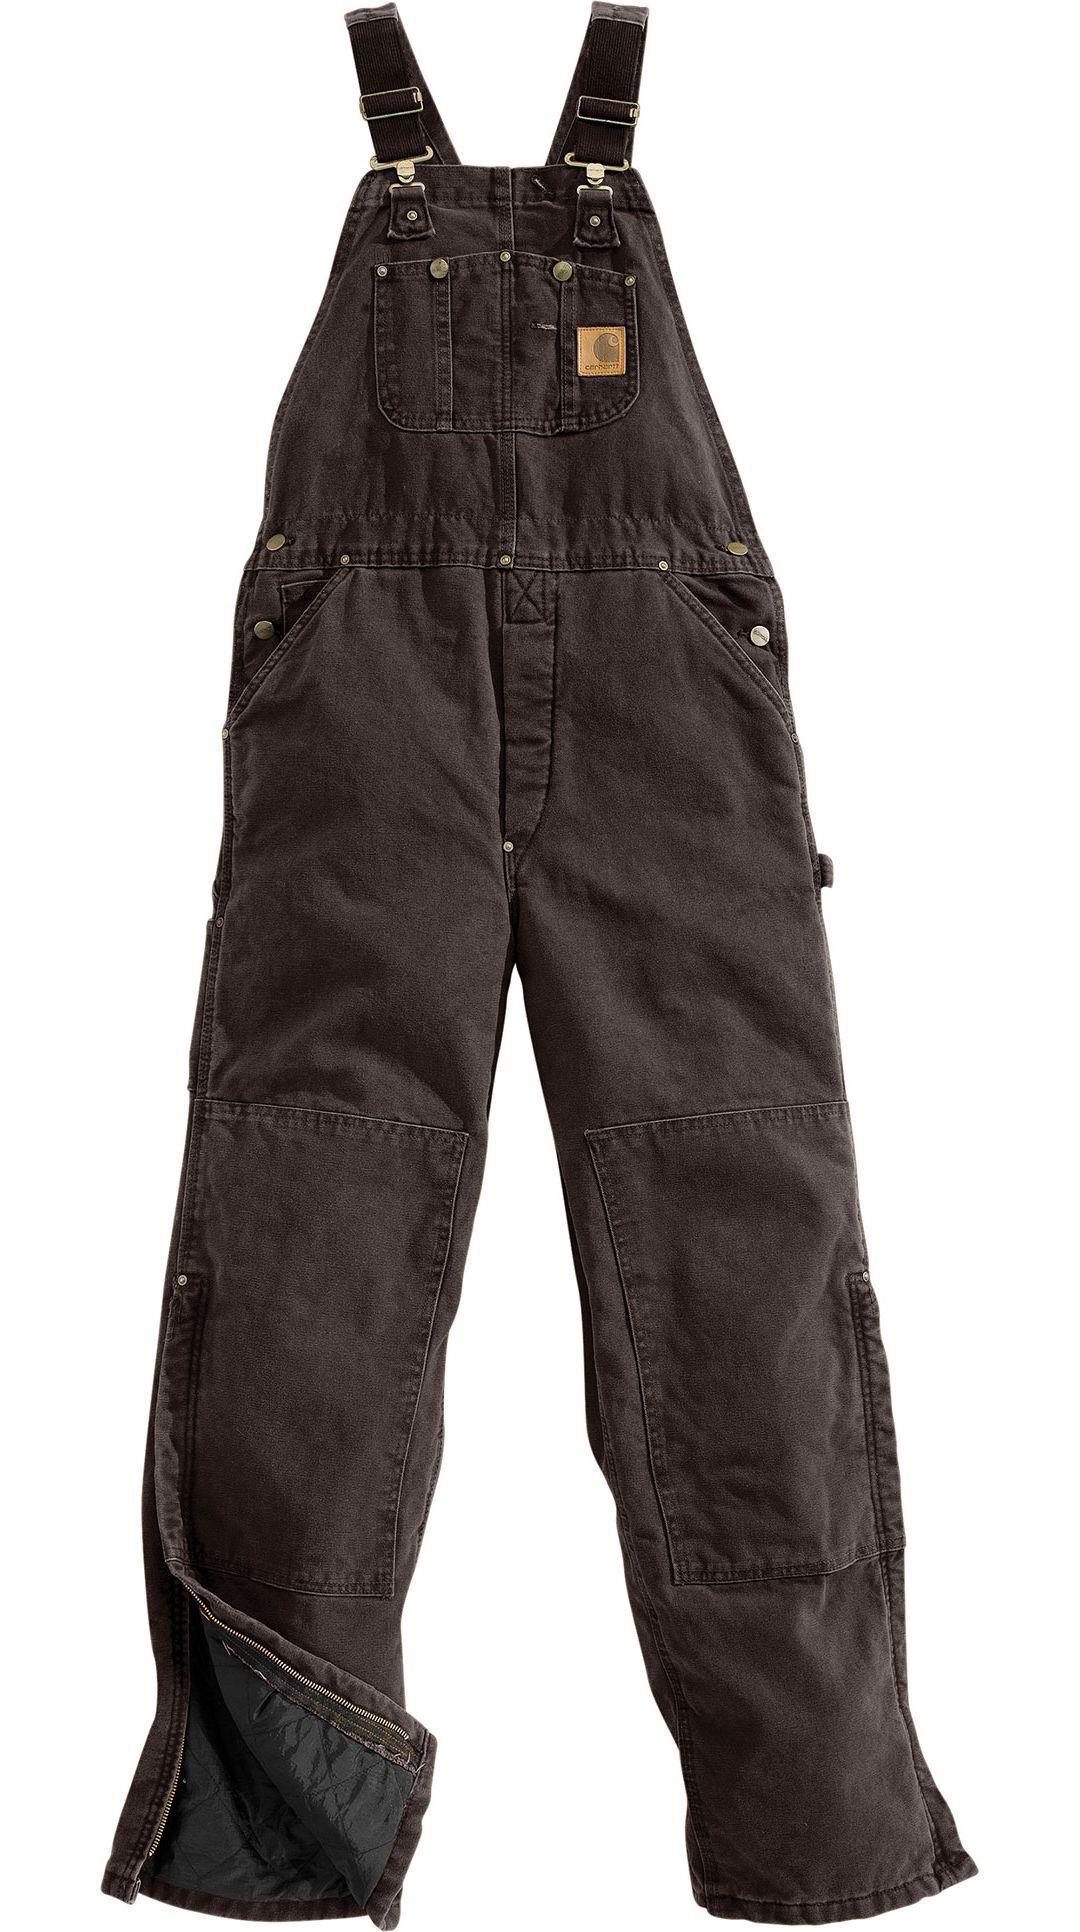 09a31a32c7 Carhartt Men's Sandstone Duck Quilt-Lined Overall Bib | Field & Stream